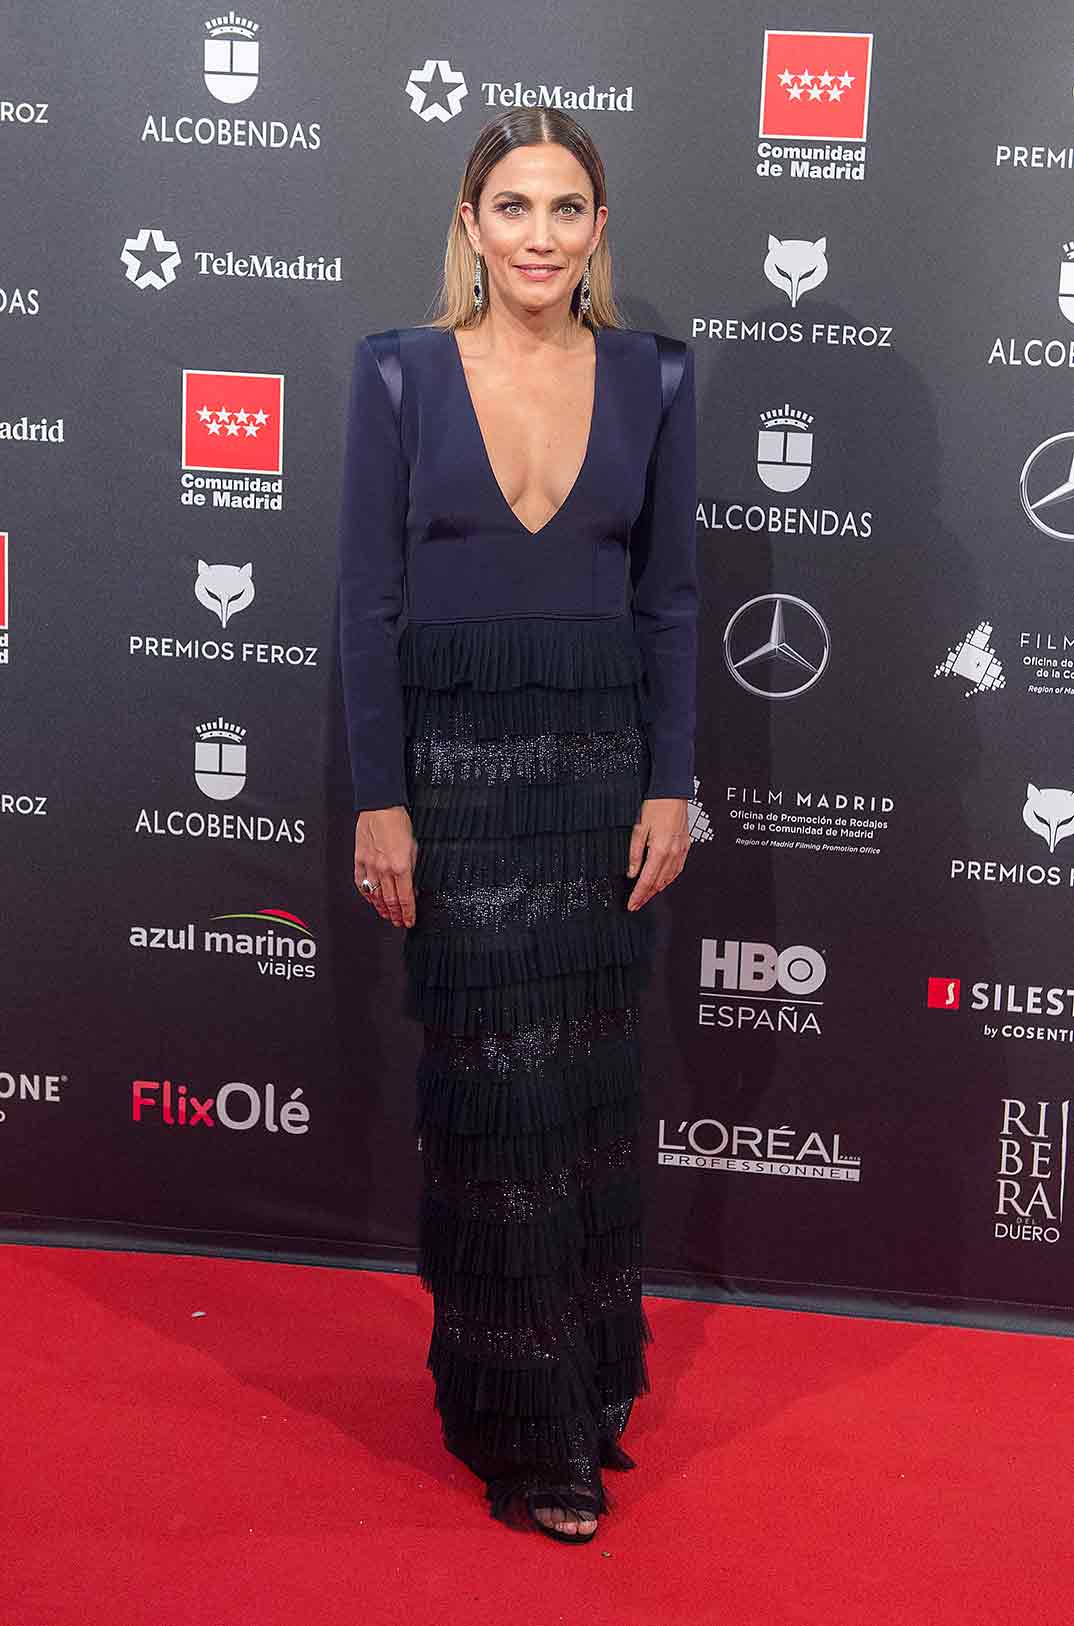 Toni Acosta - Premios Feroz 2020